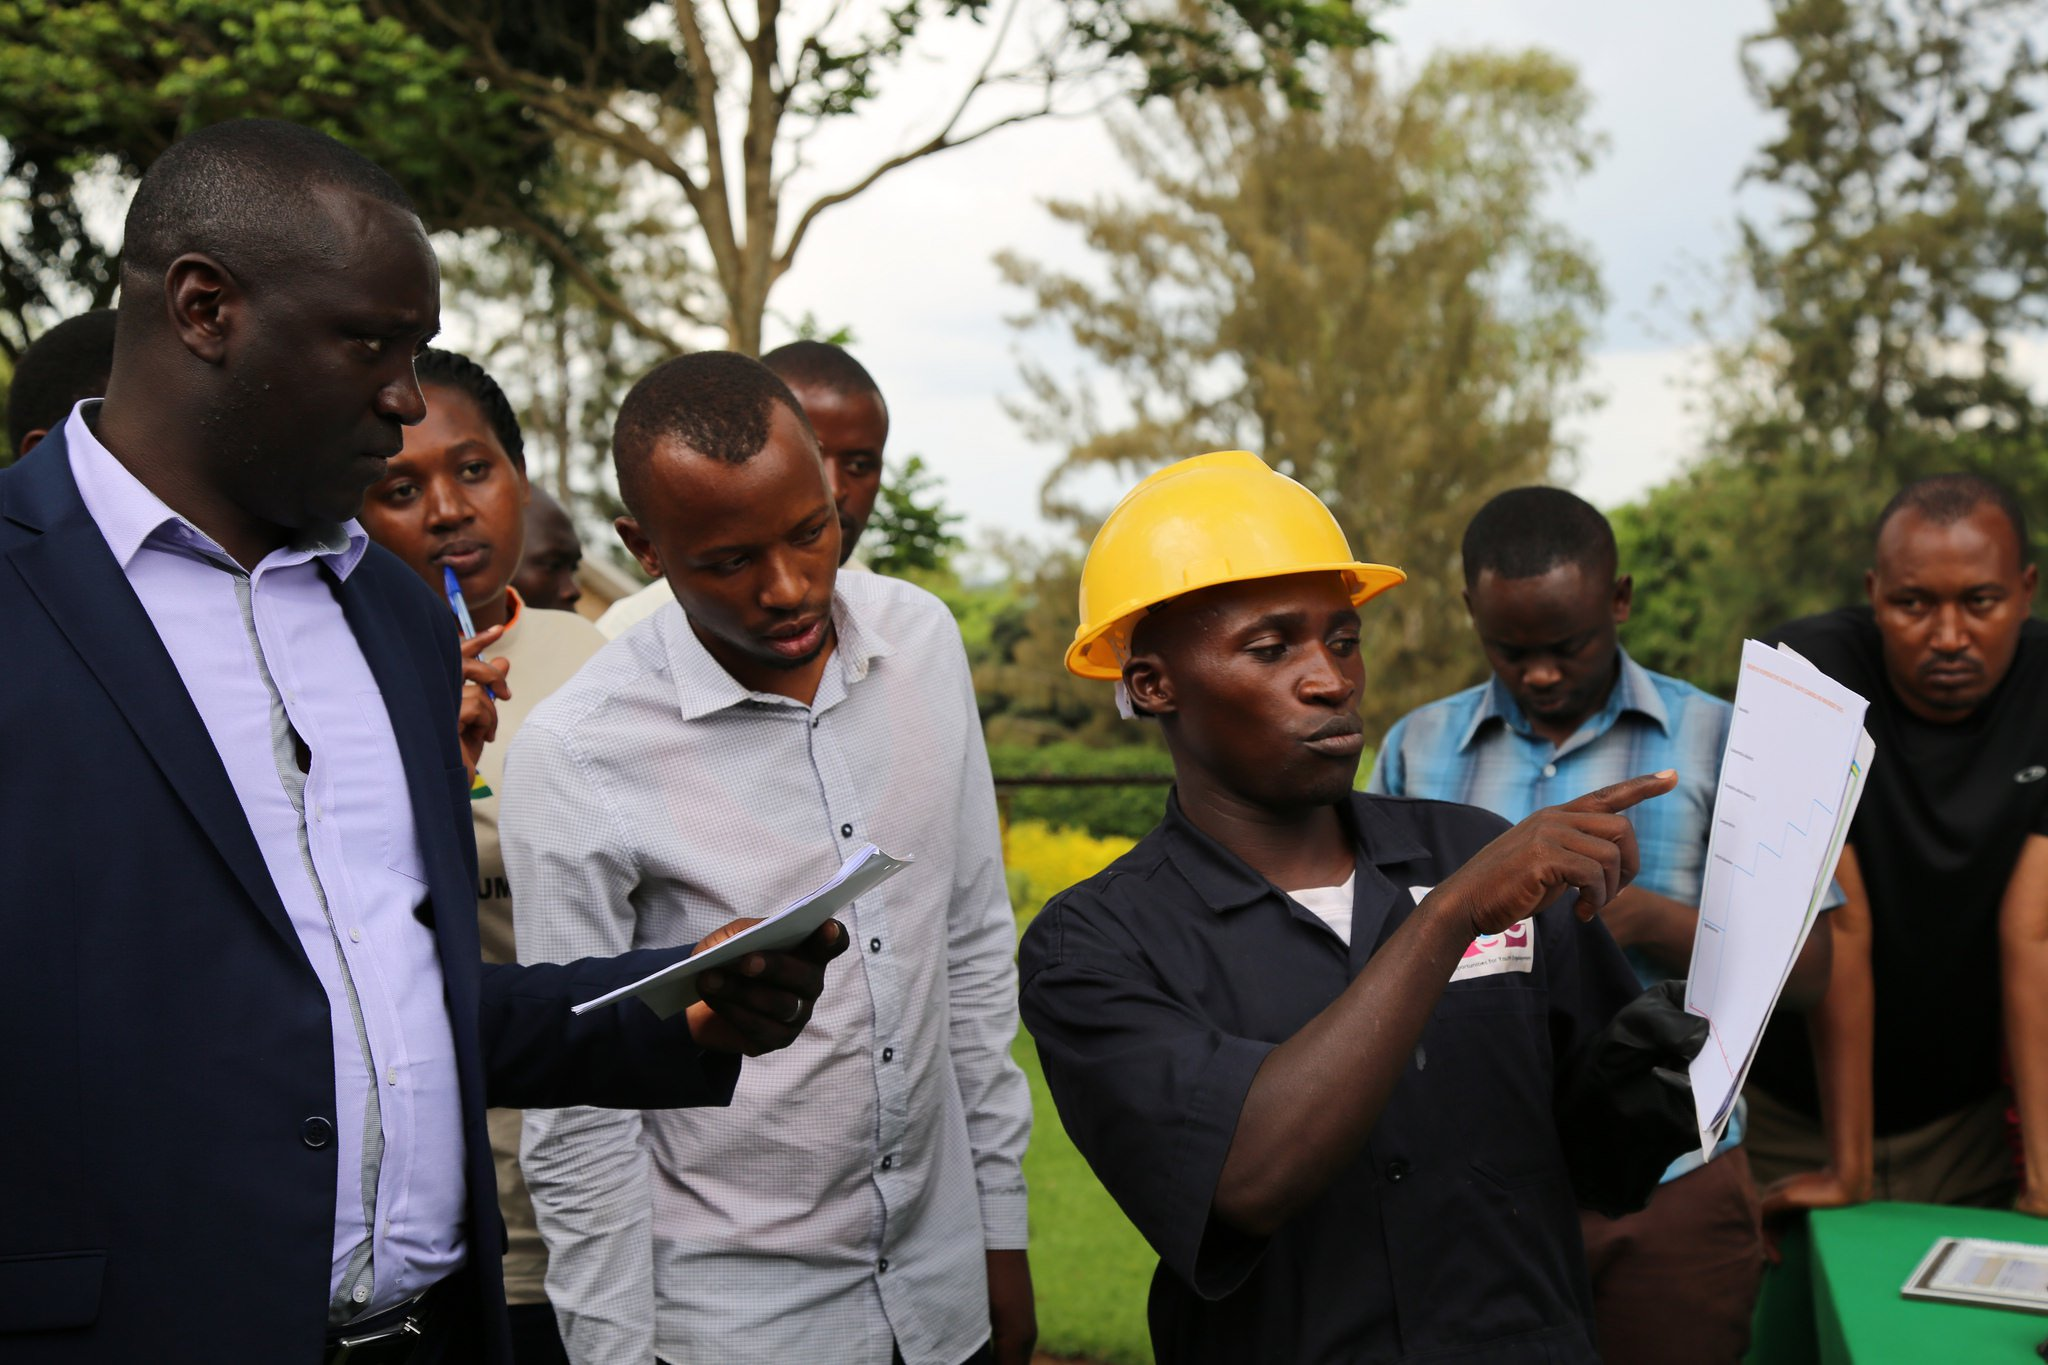 Rwanda Green Fund Sponsored Youth Connekt Awards - Eastern Province. Photo: Rwanda Green Fund/Flickr (CC BY-ND 2.0)